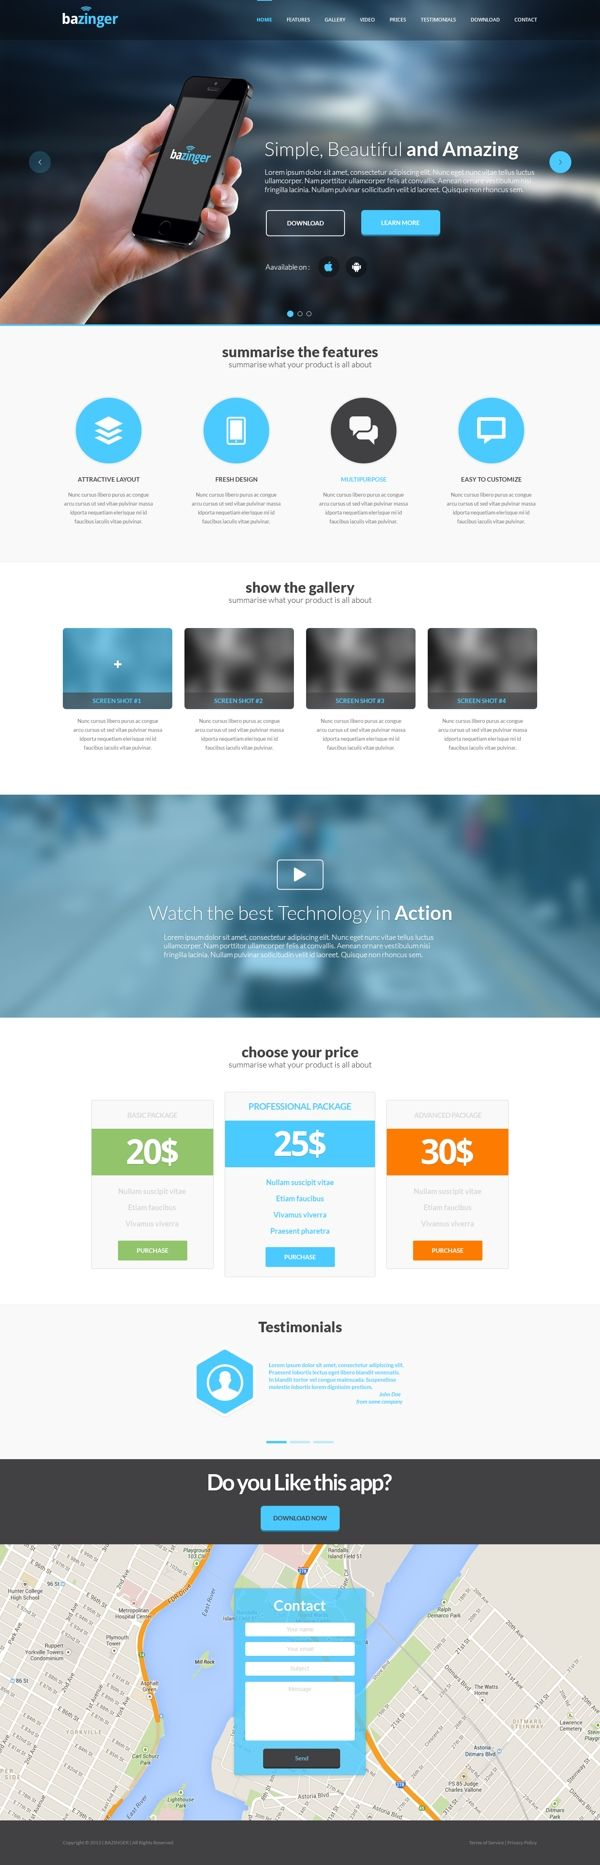 best 684 free psd templates images on pinterest design